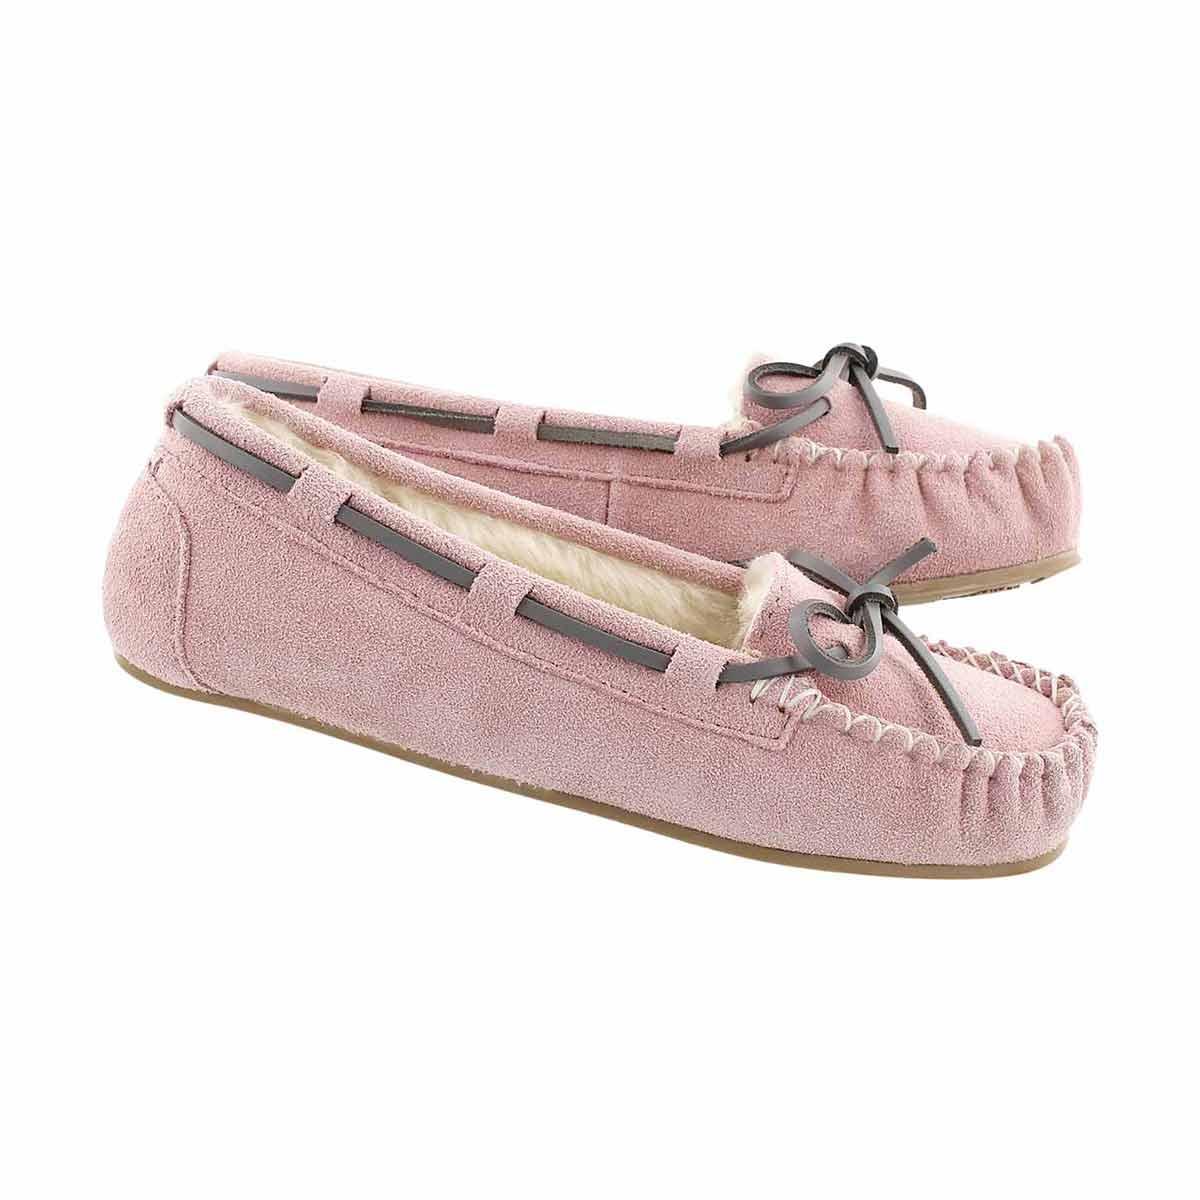 Grls Cady2 Pink ballerina moccasin